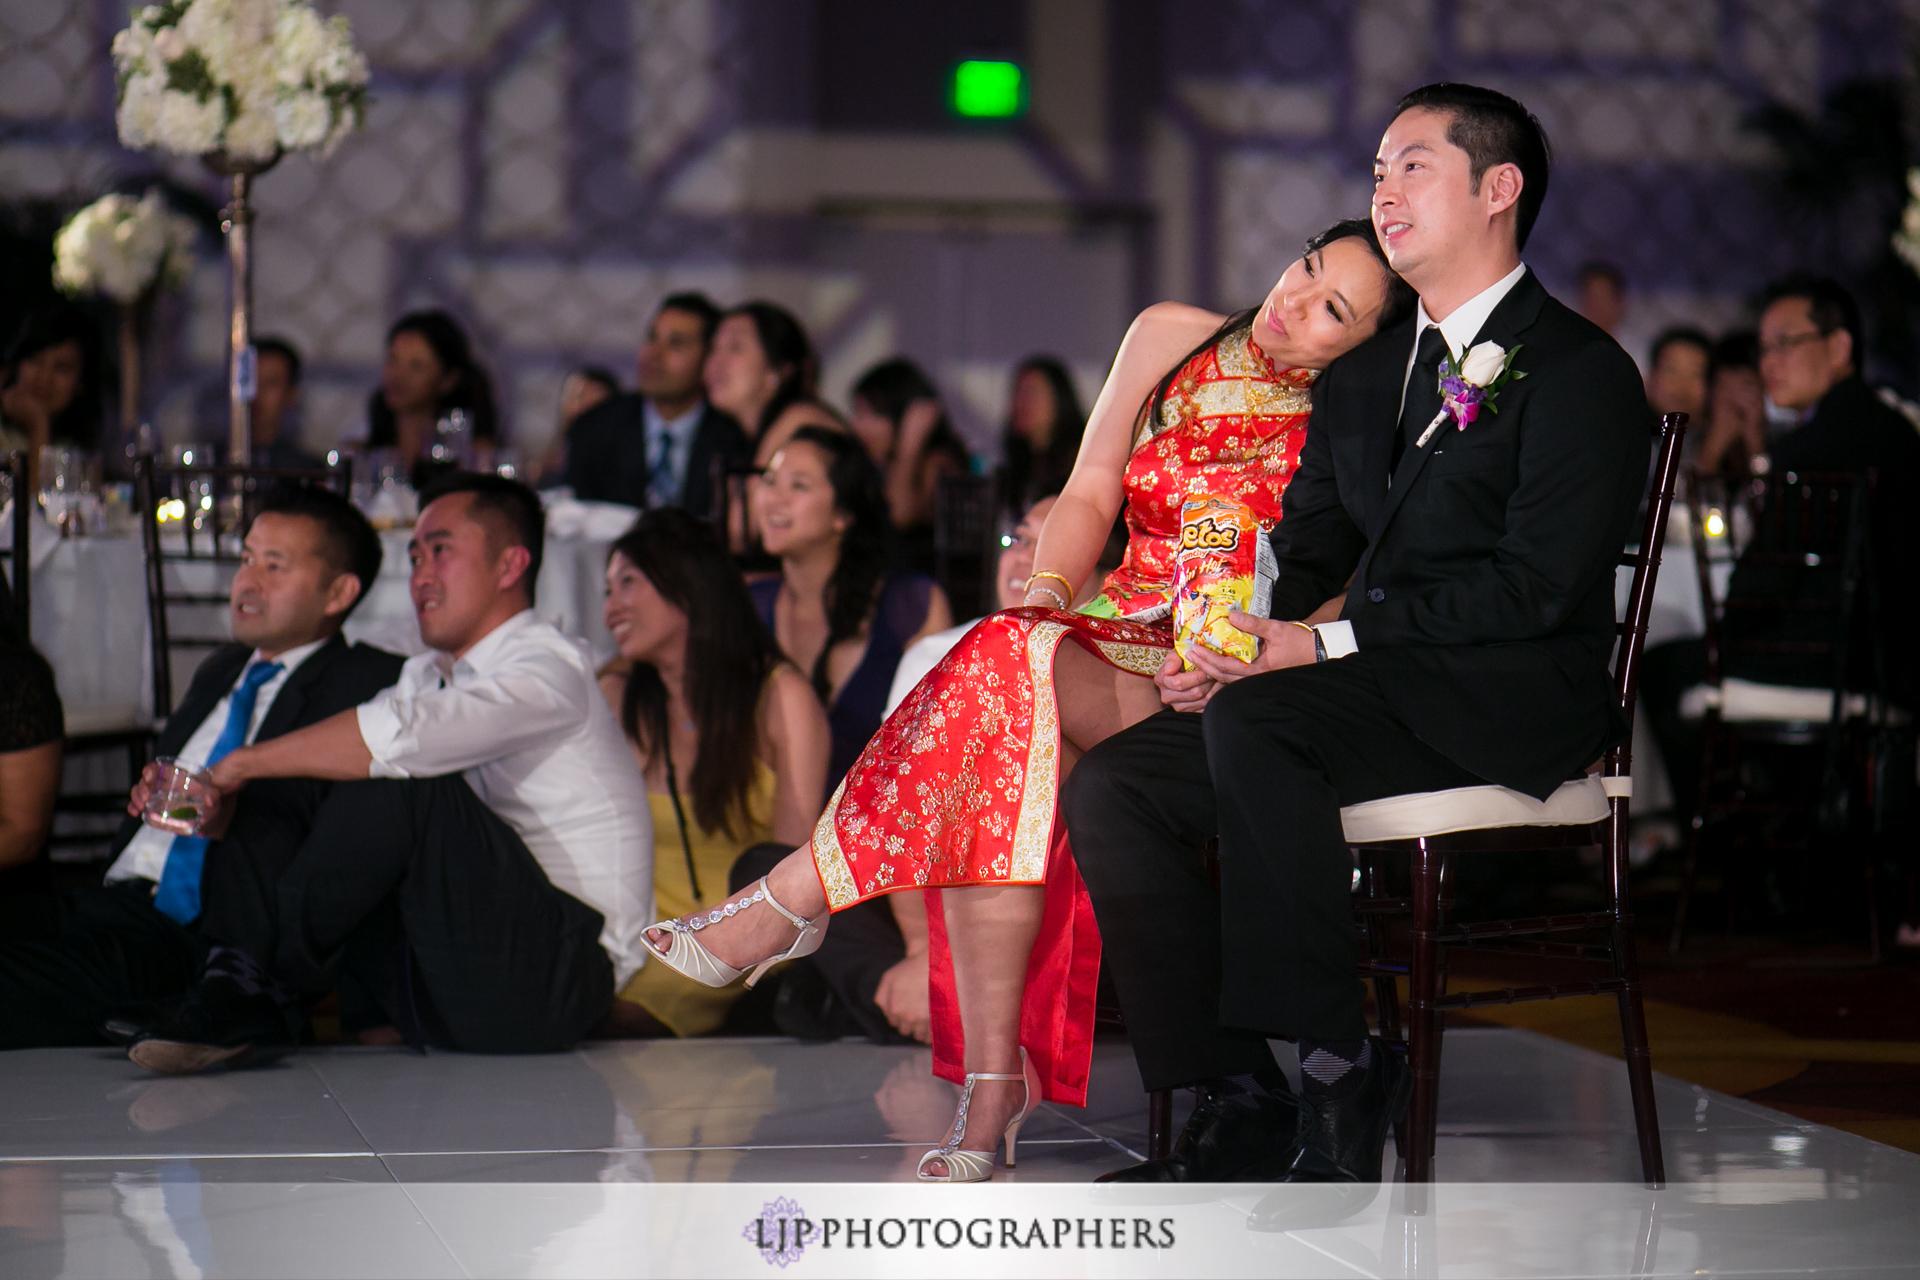 33-jw-marriott-los-angeles-wedding-photographer-wedding-reception-photos